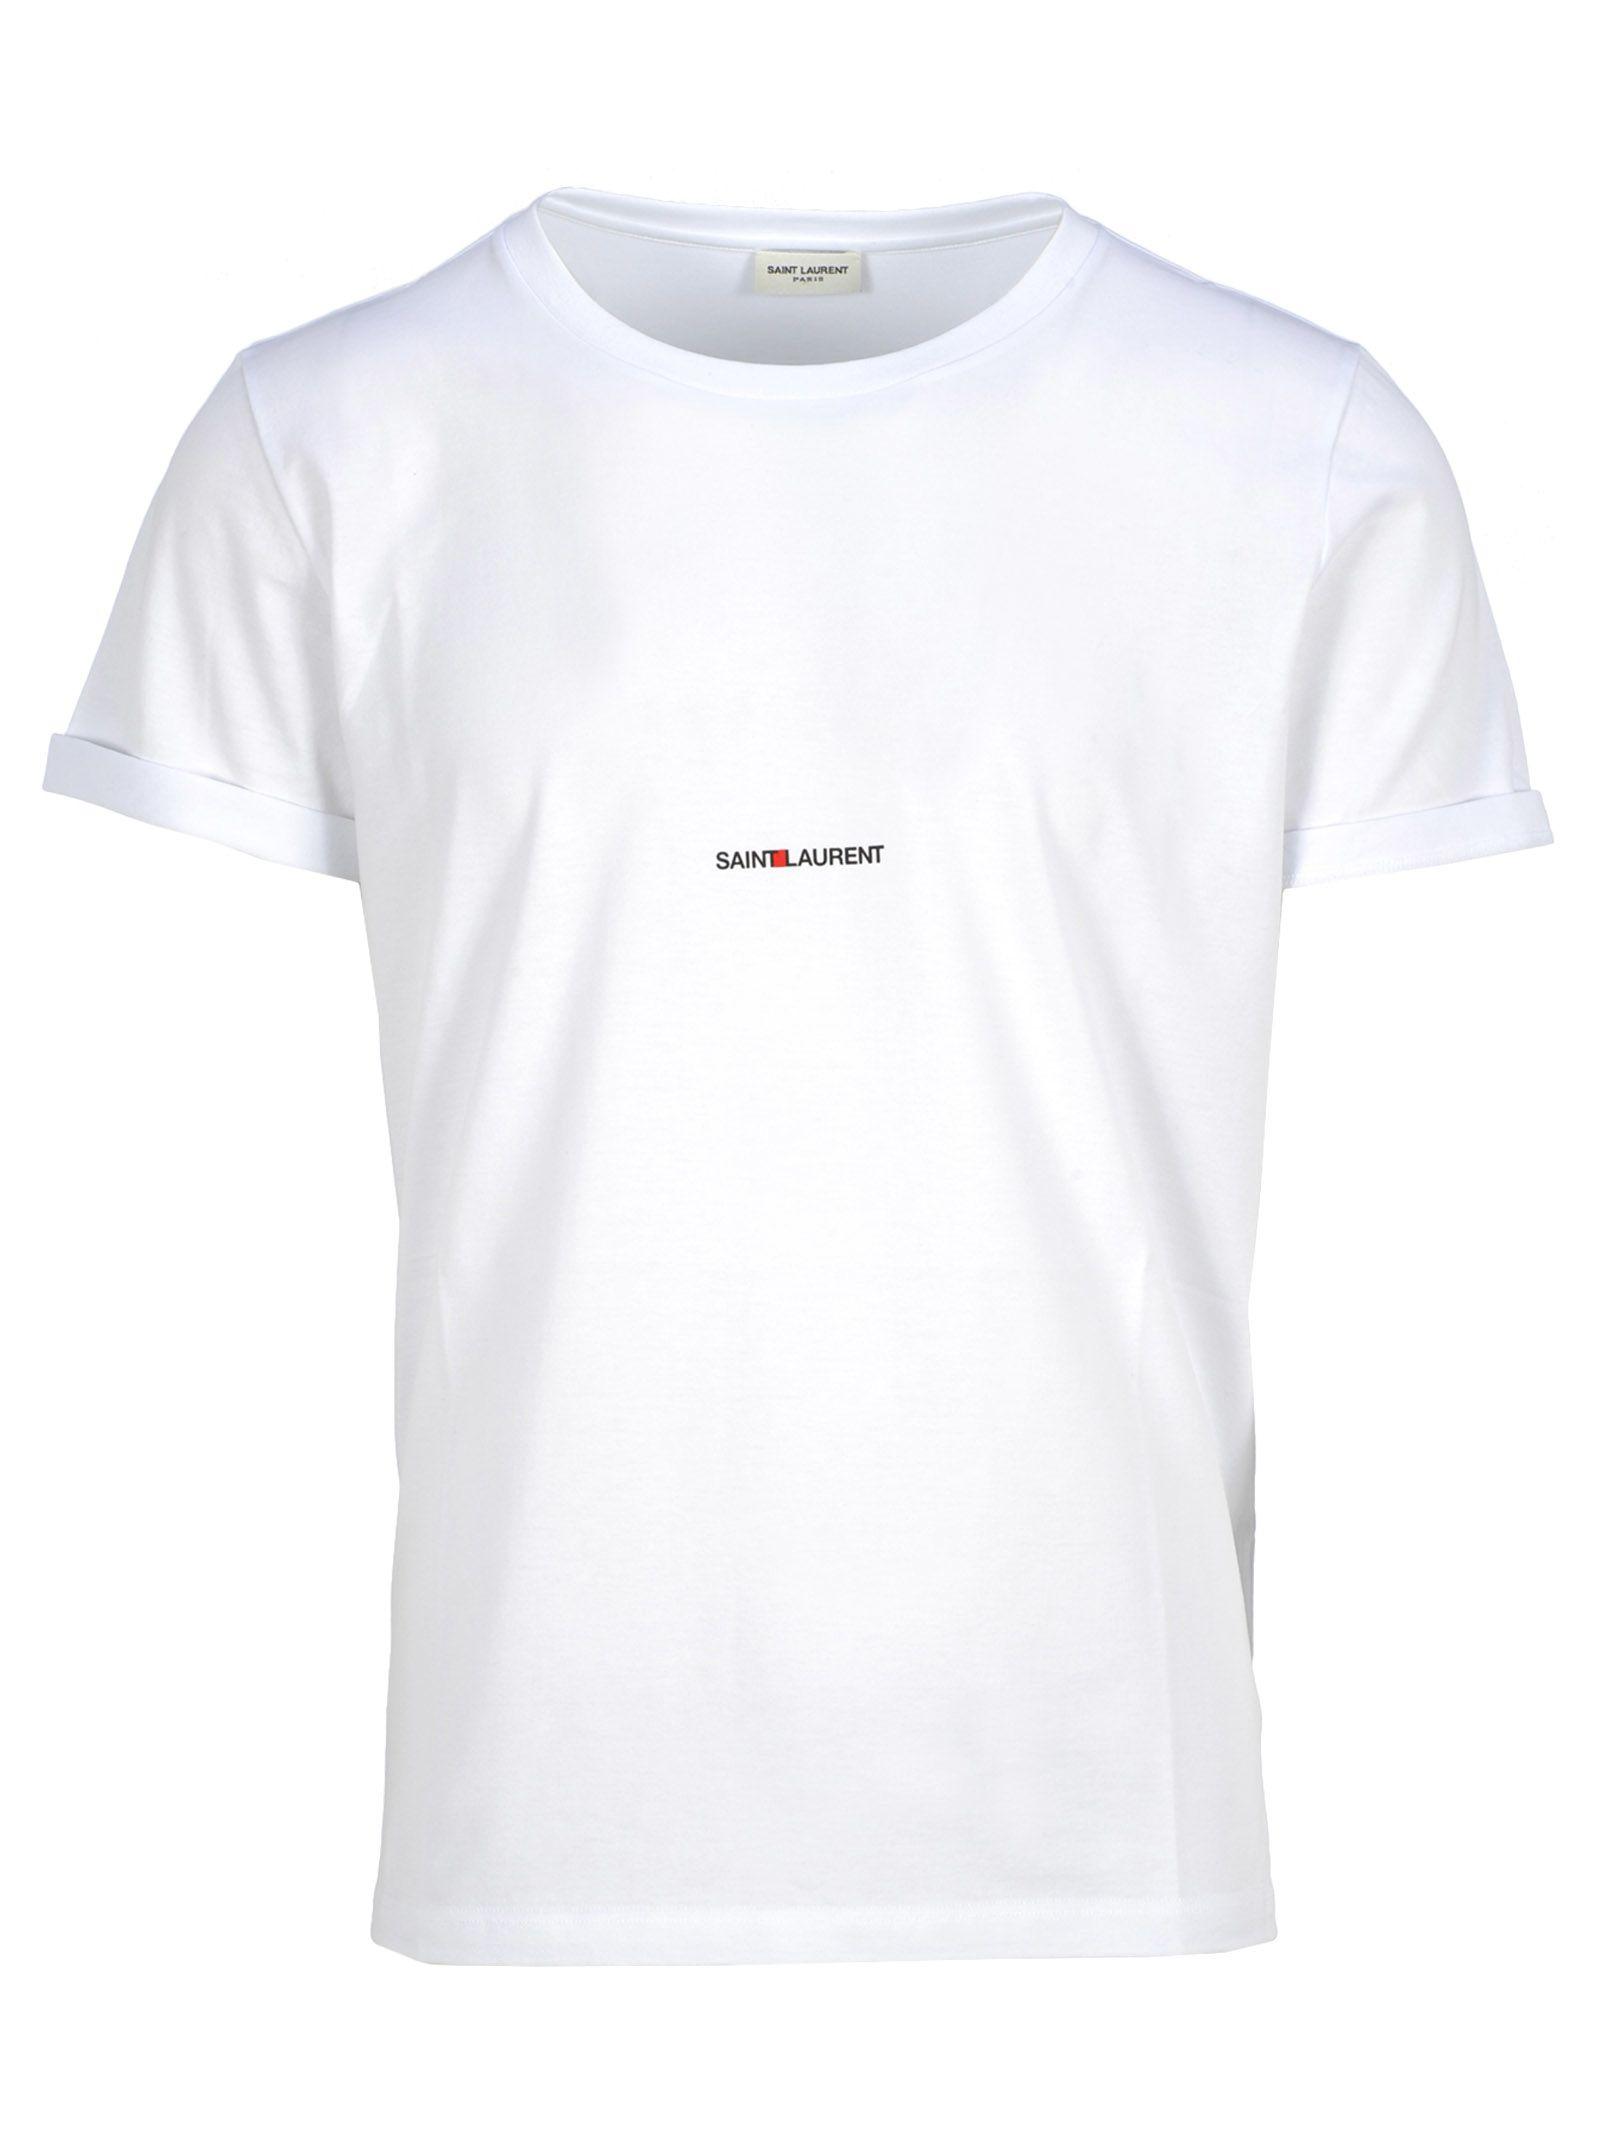 be2f8651 Saint Laurent Saint Laurent Saint Laurent Classic Logo T-shirt ...